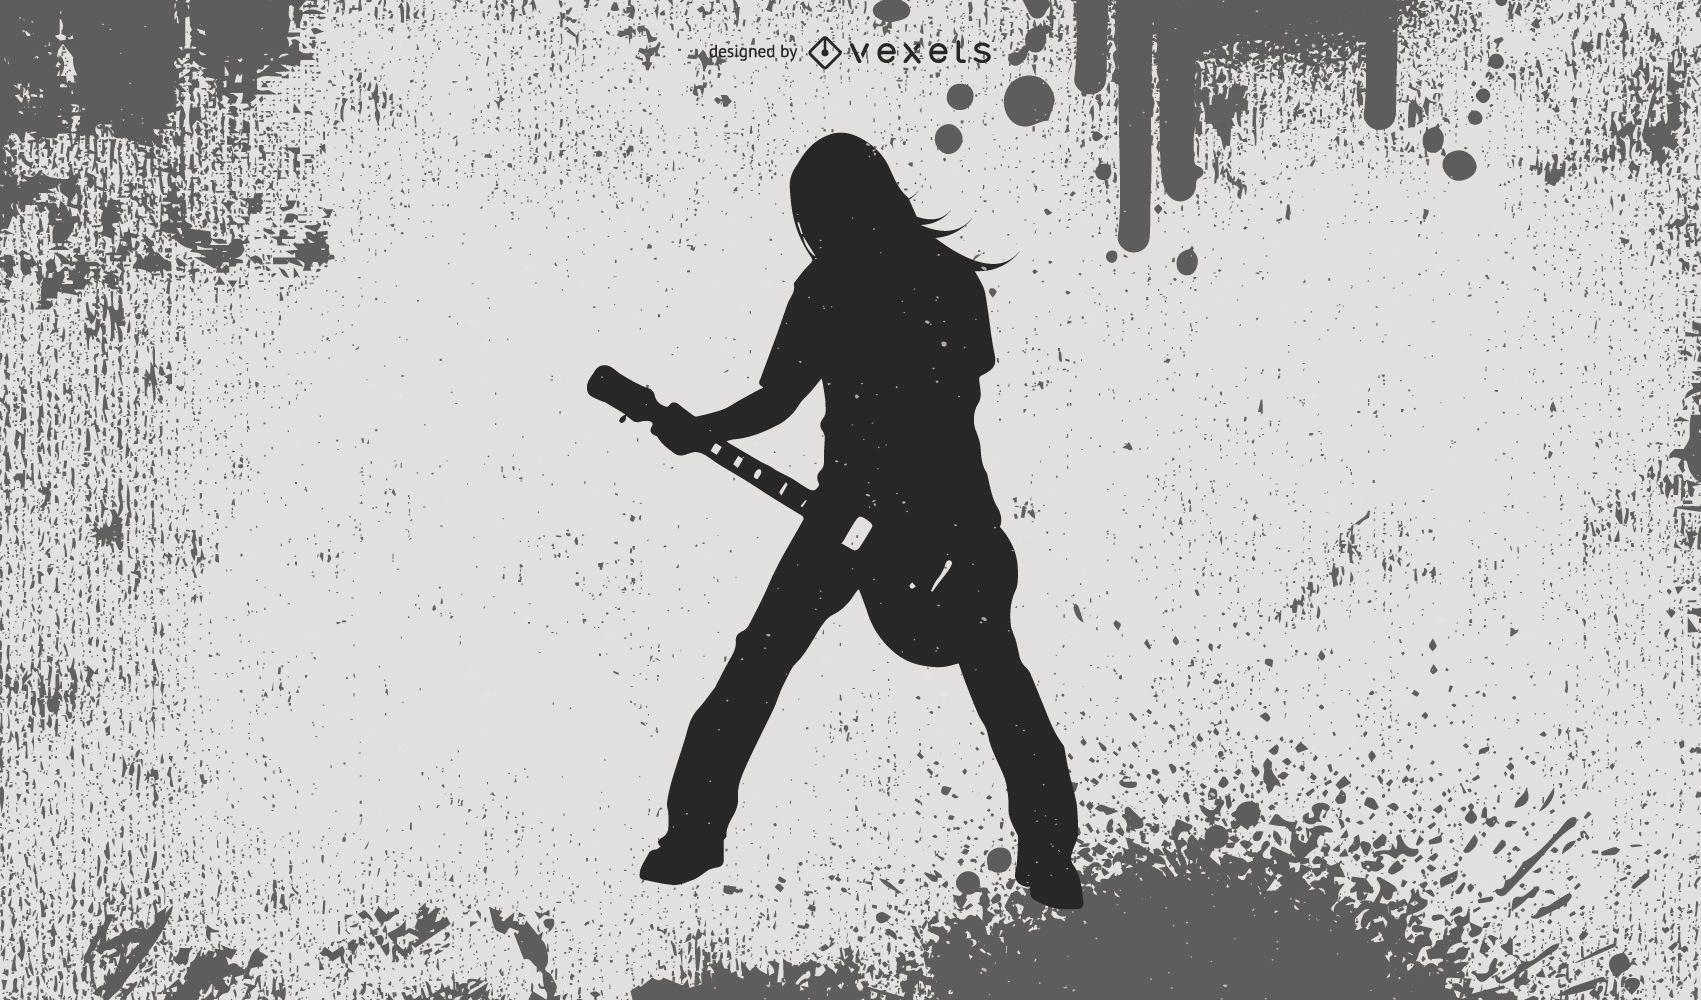 Heavy Metal Guy Silhouette